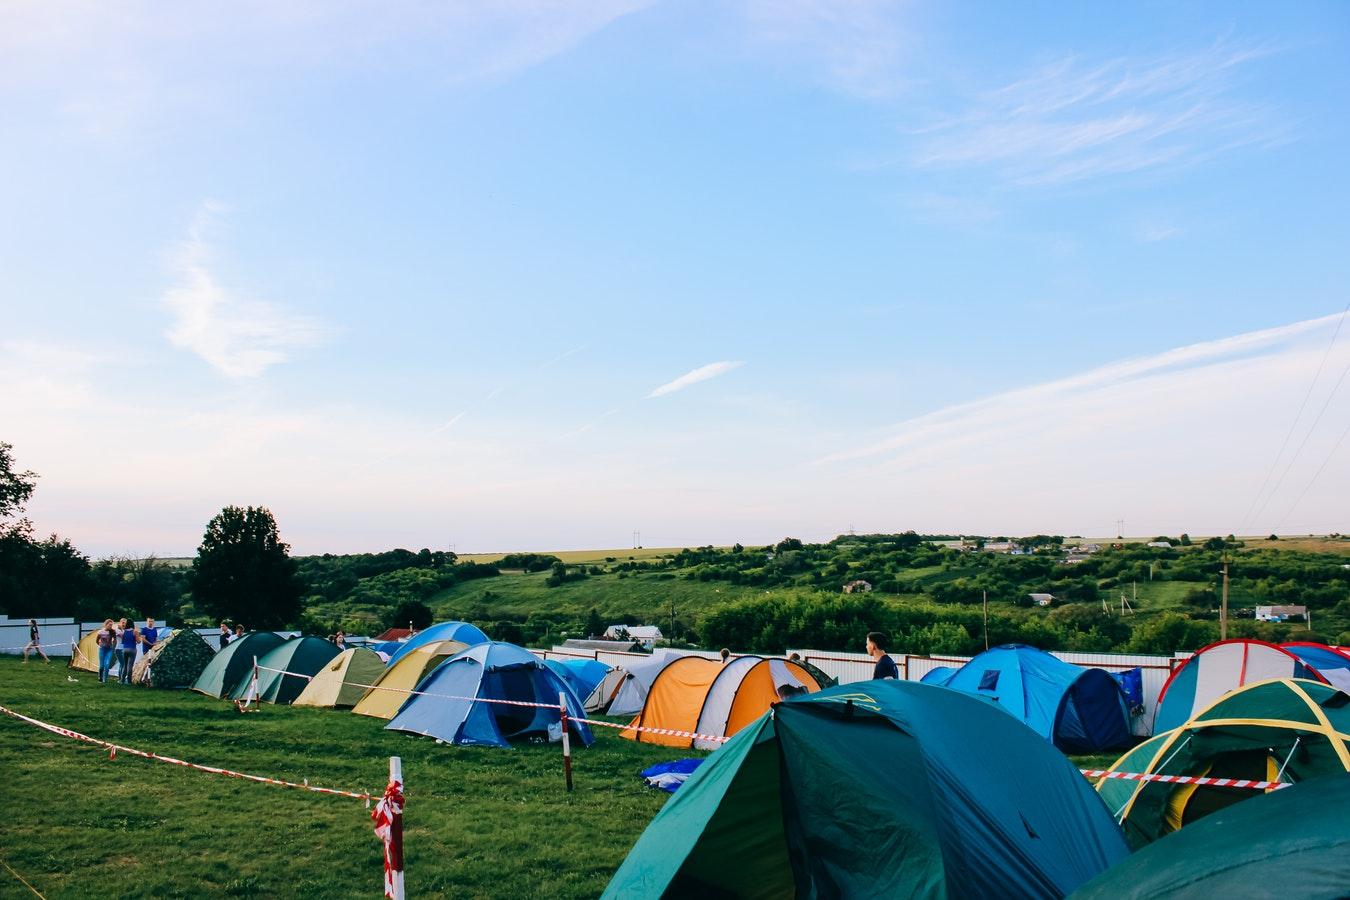 Image: Festival Tents